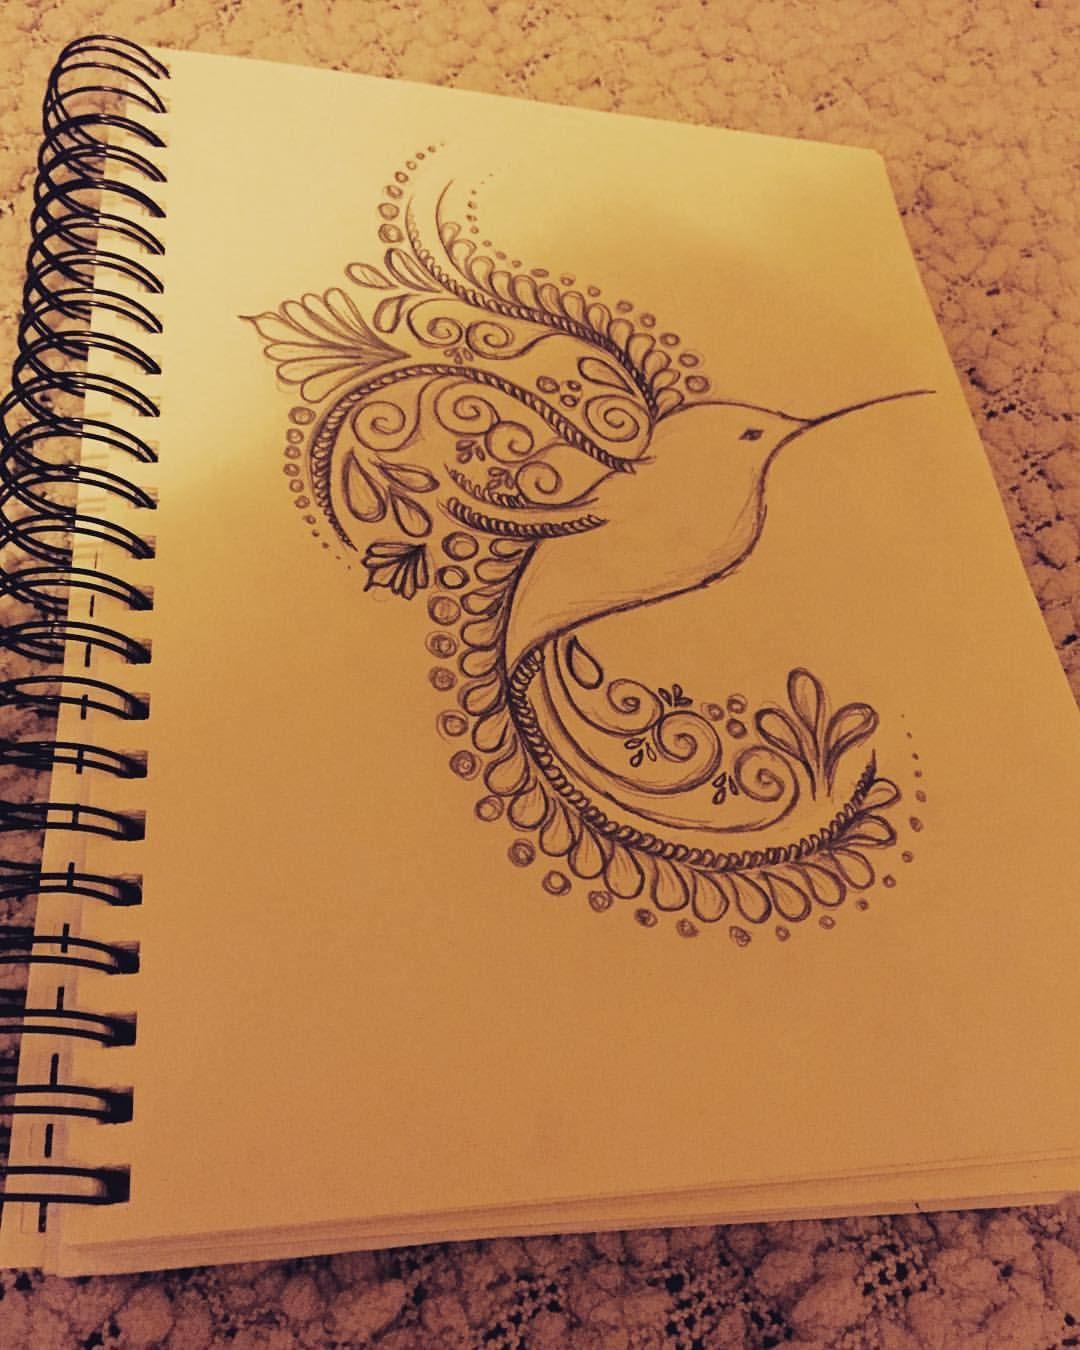 Henna inspired humming bird bird drawing hennainspired draw pencil sketch birddrawing henna hummingbird instagood instadaily instalike love